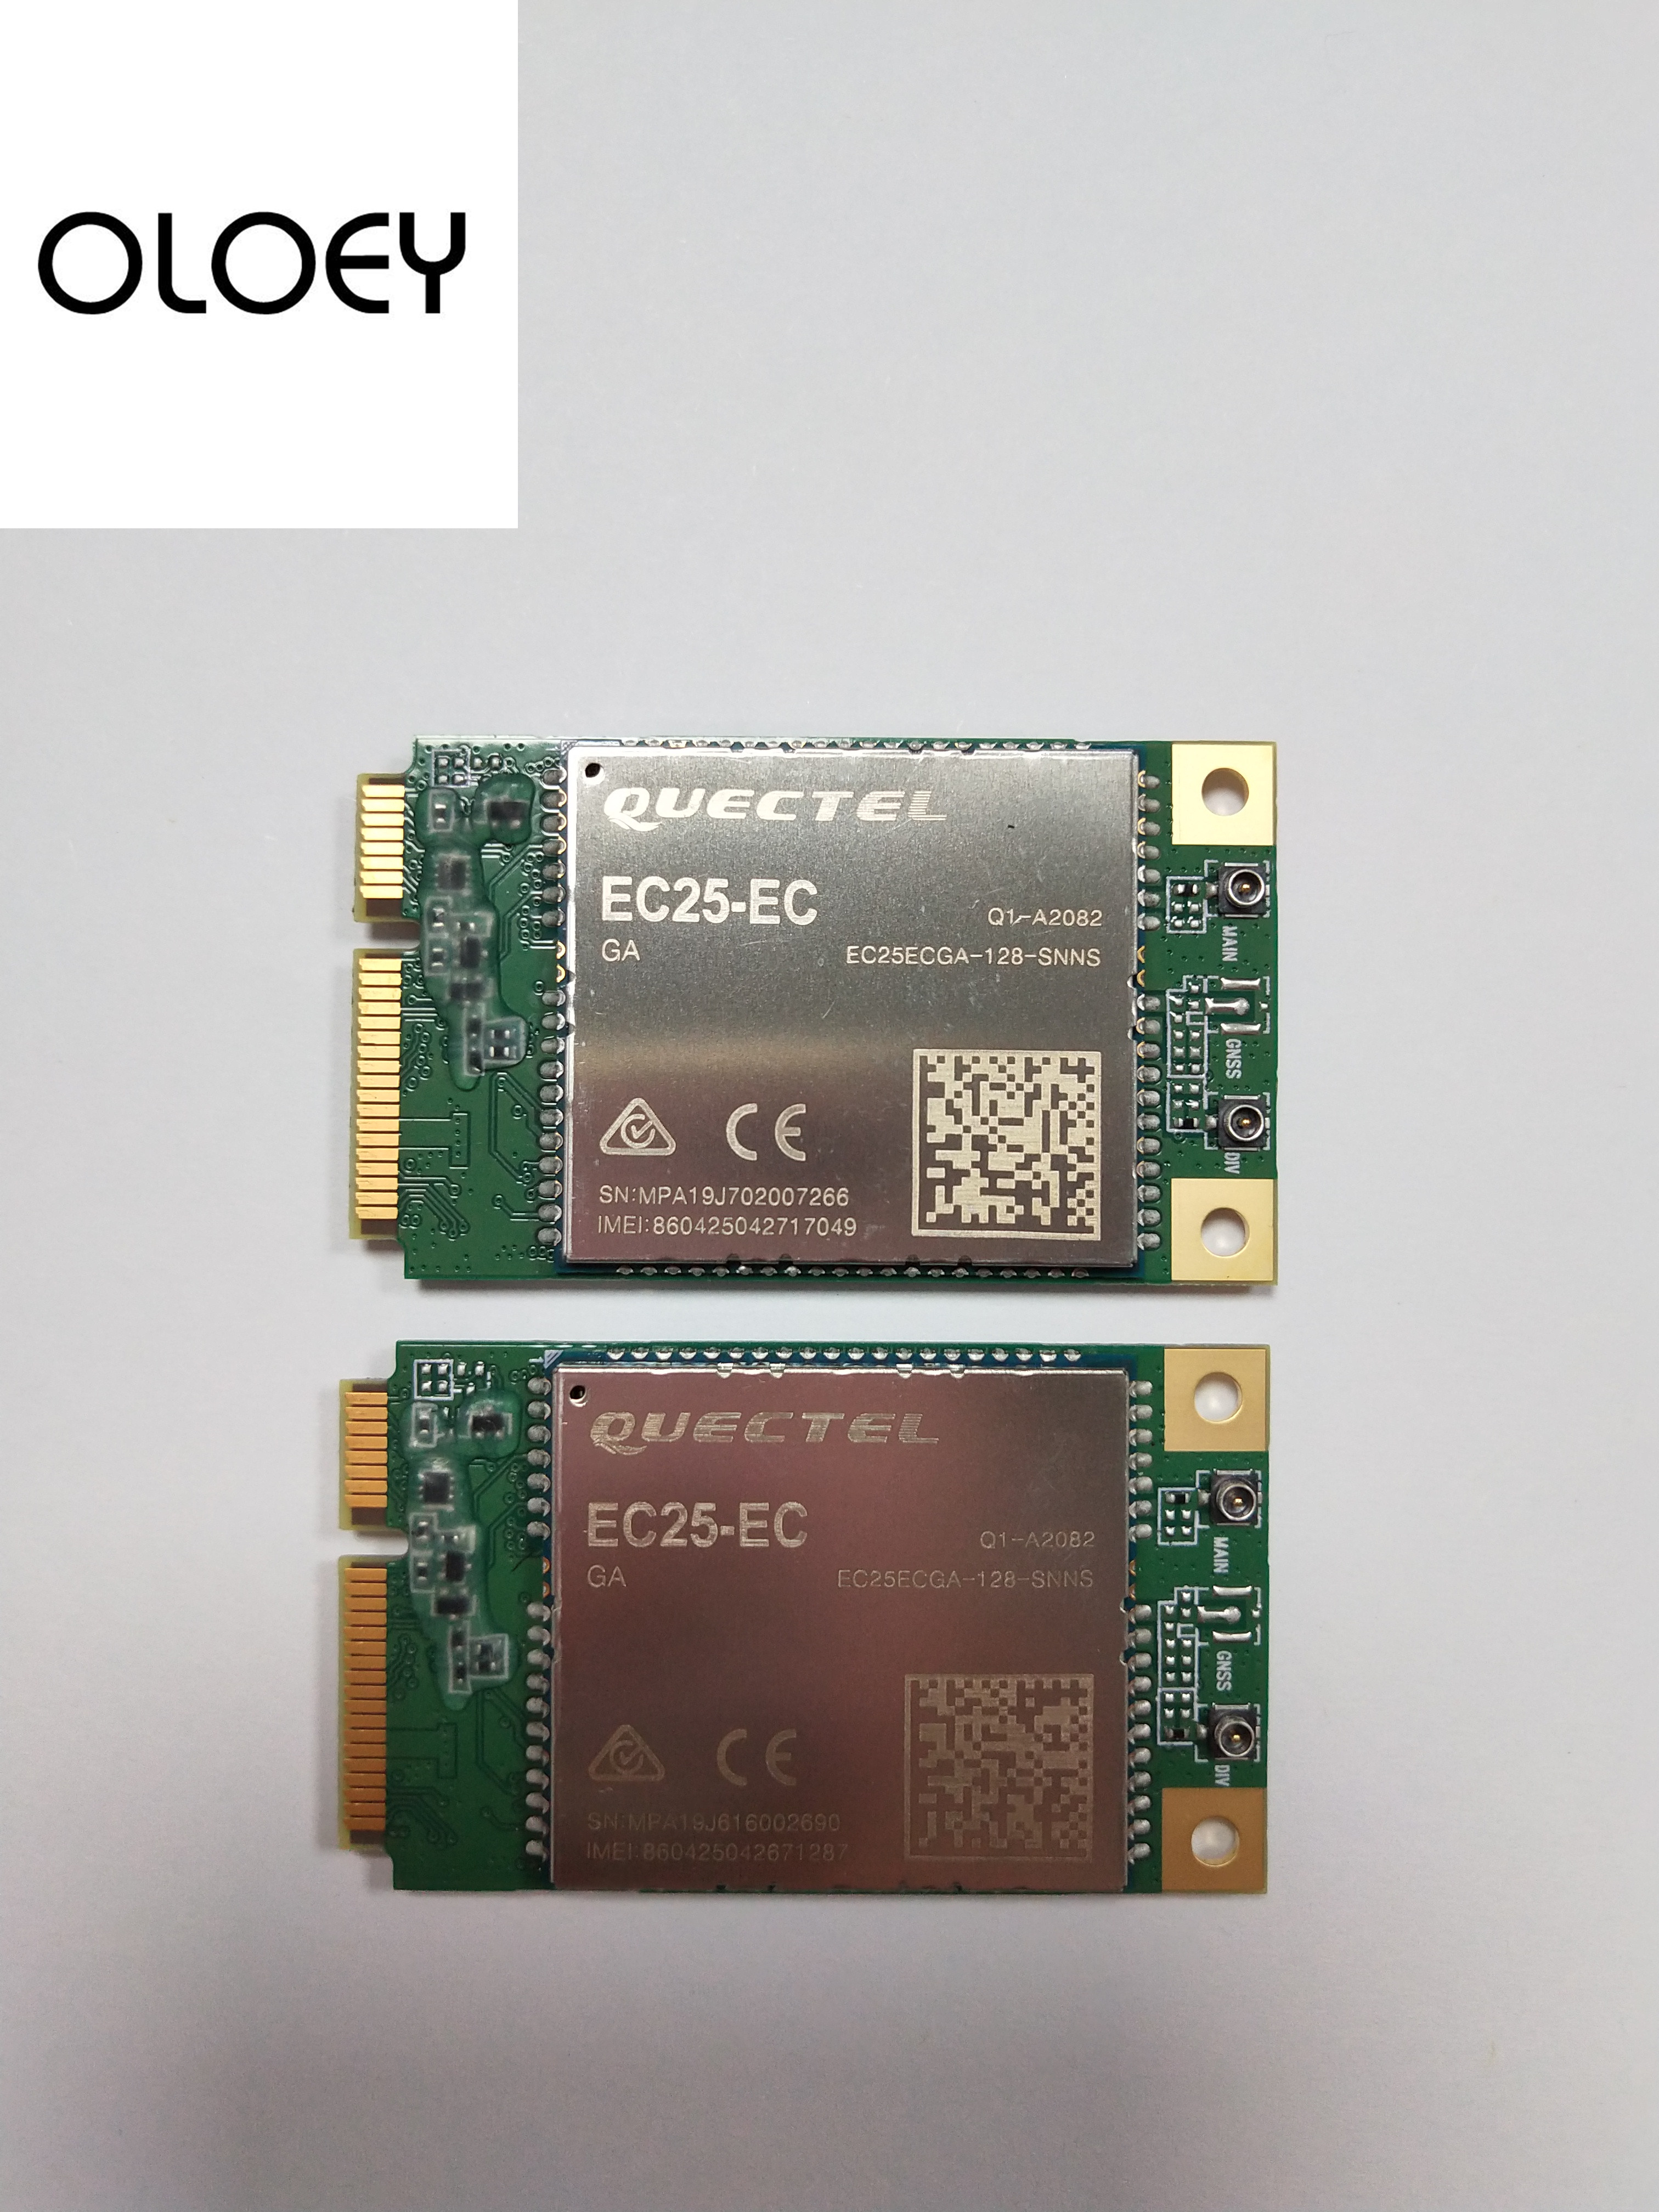 EC25ECGA-MINIPCIE LTE Modules 4G Moudule, Contains The Card Slot, 100% Brand New Original